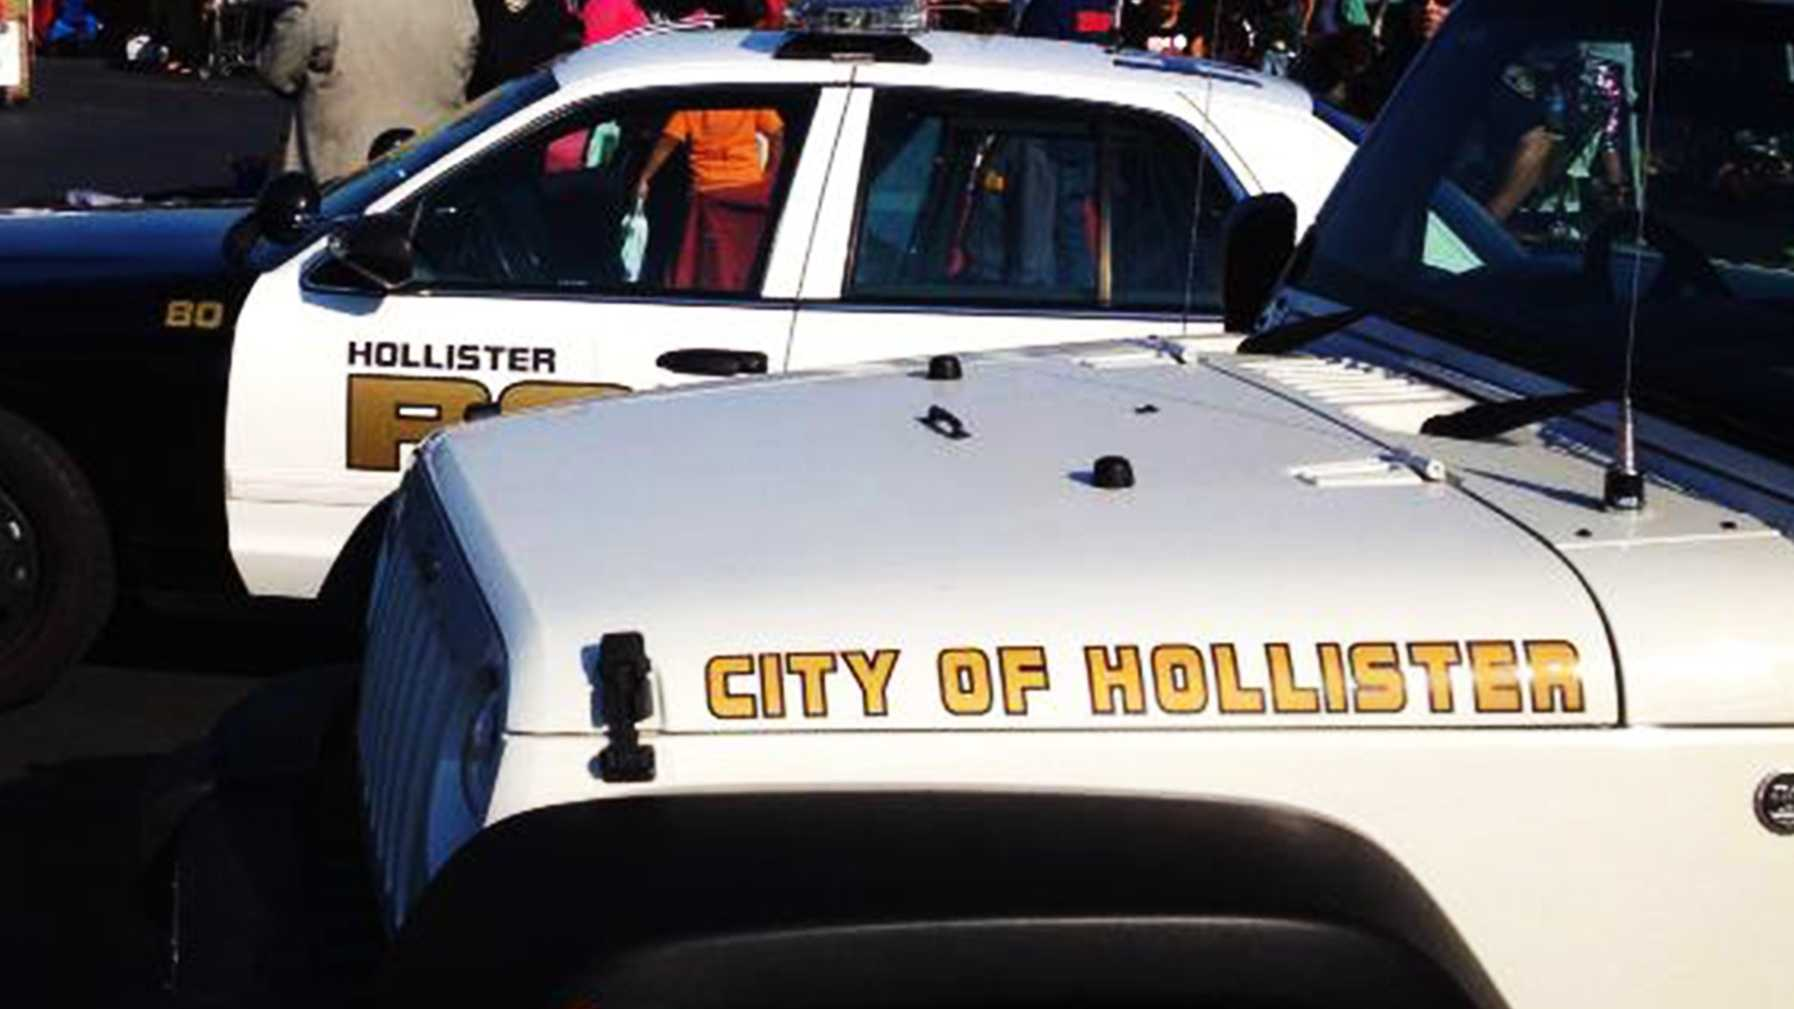 hollister cops.jpg